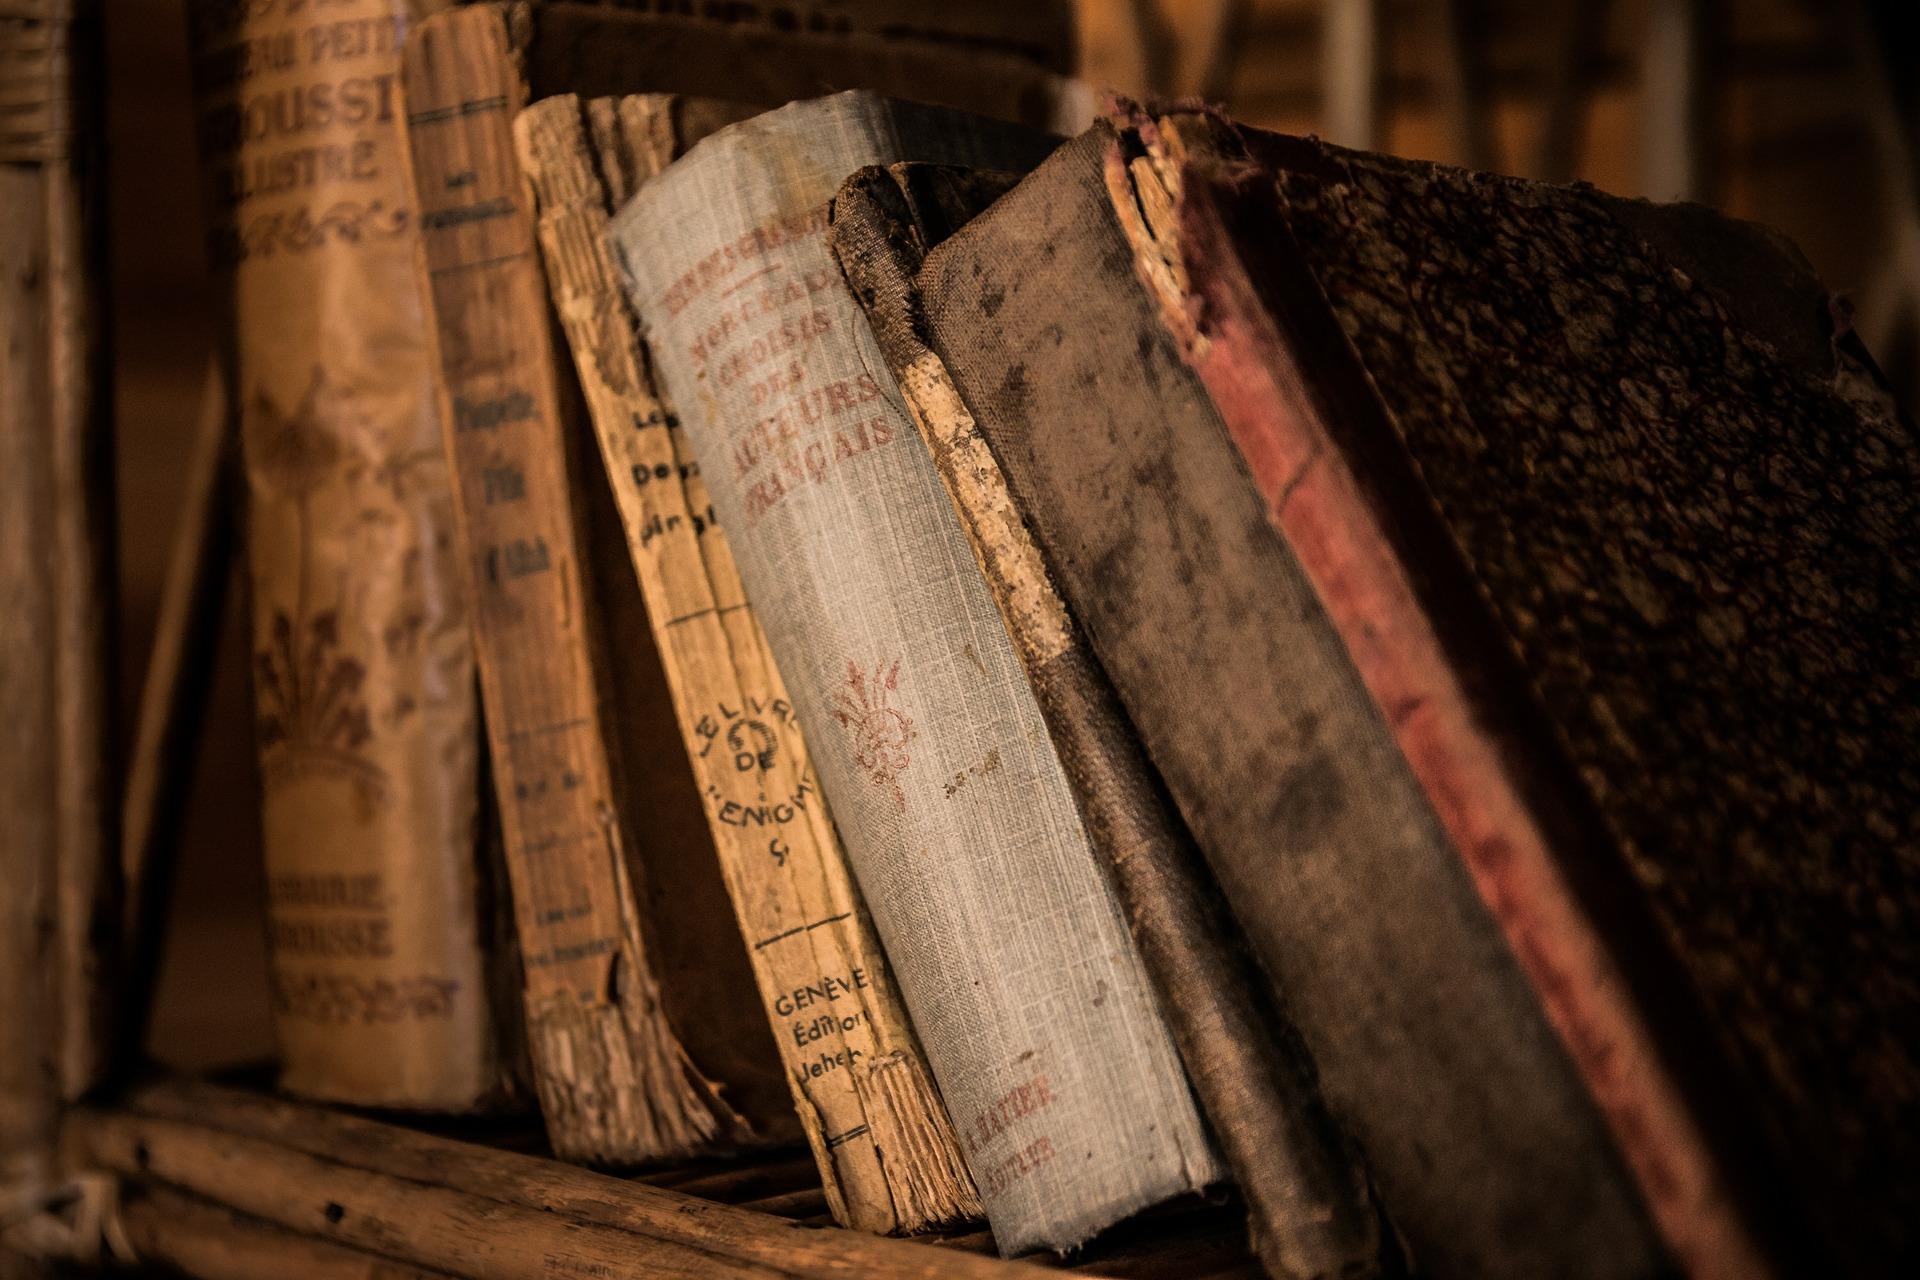 Books about England   © Jarmoluk pixabay.com